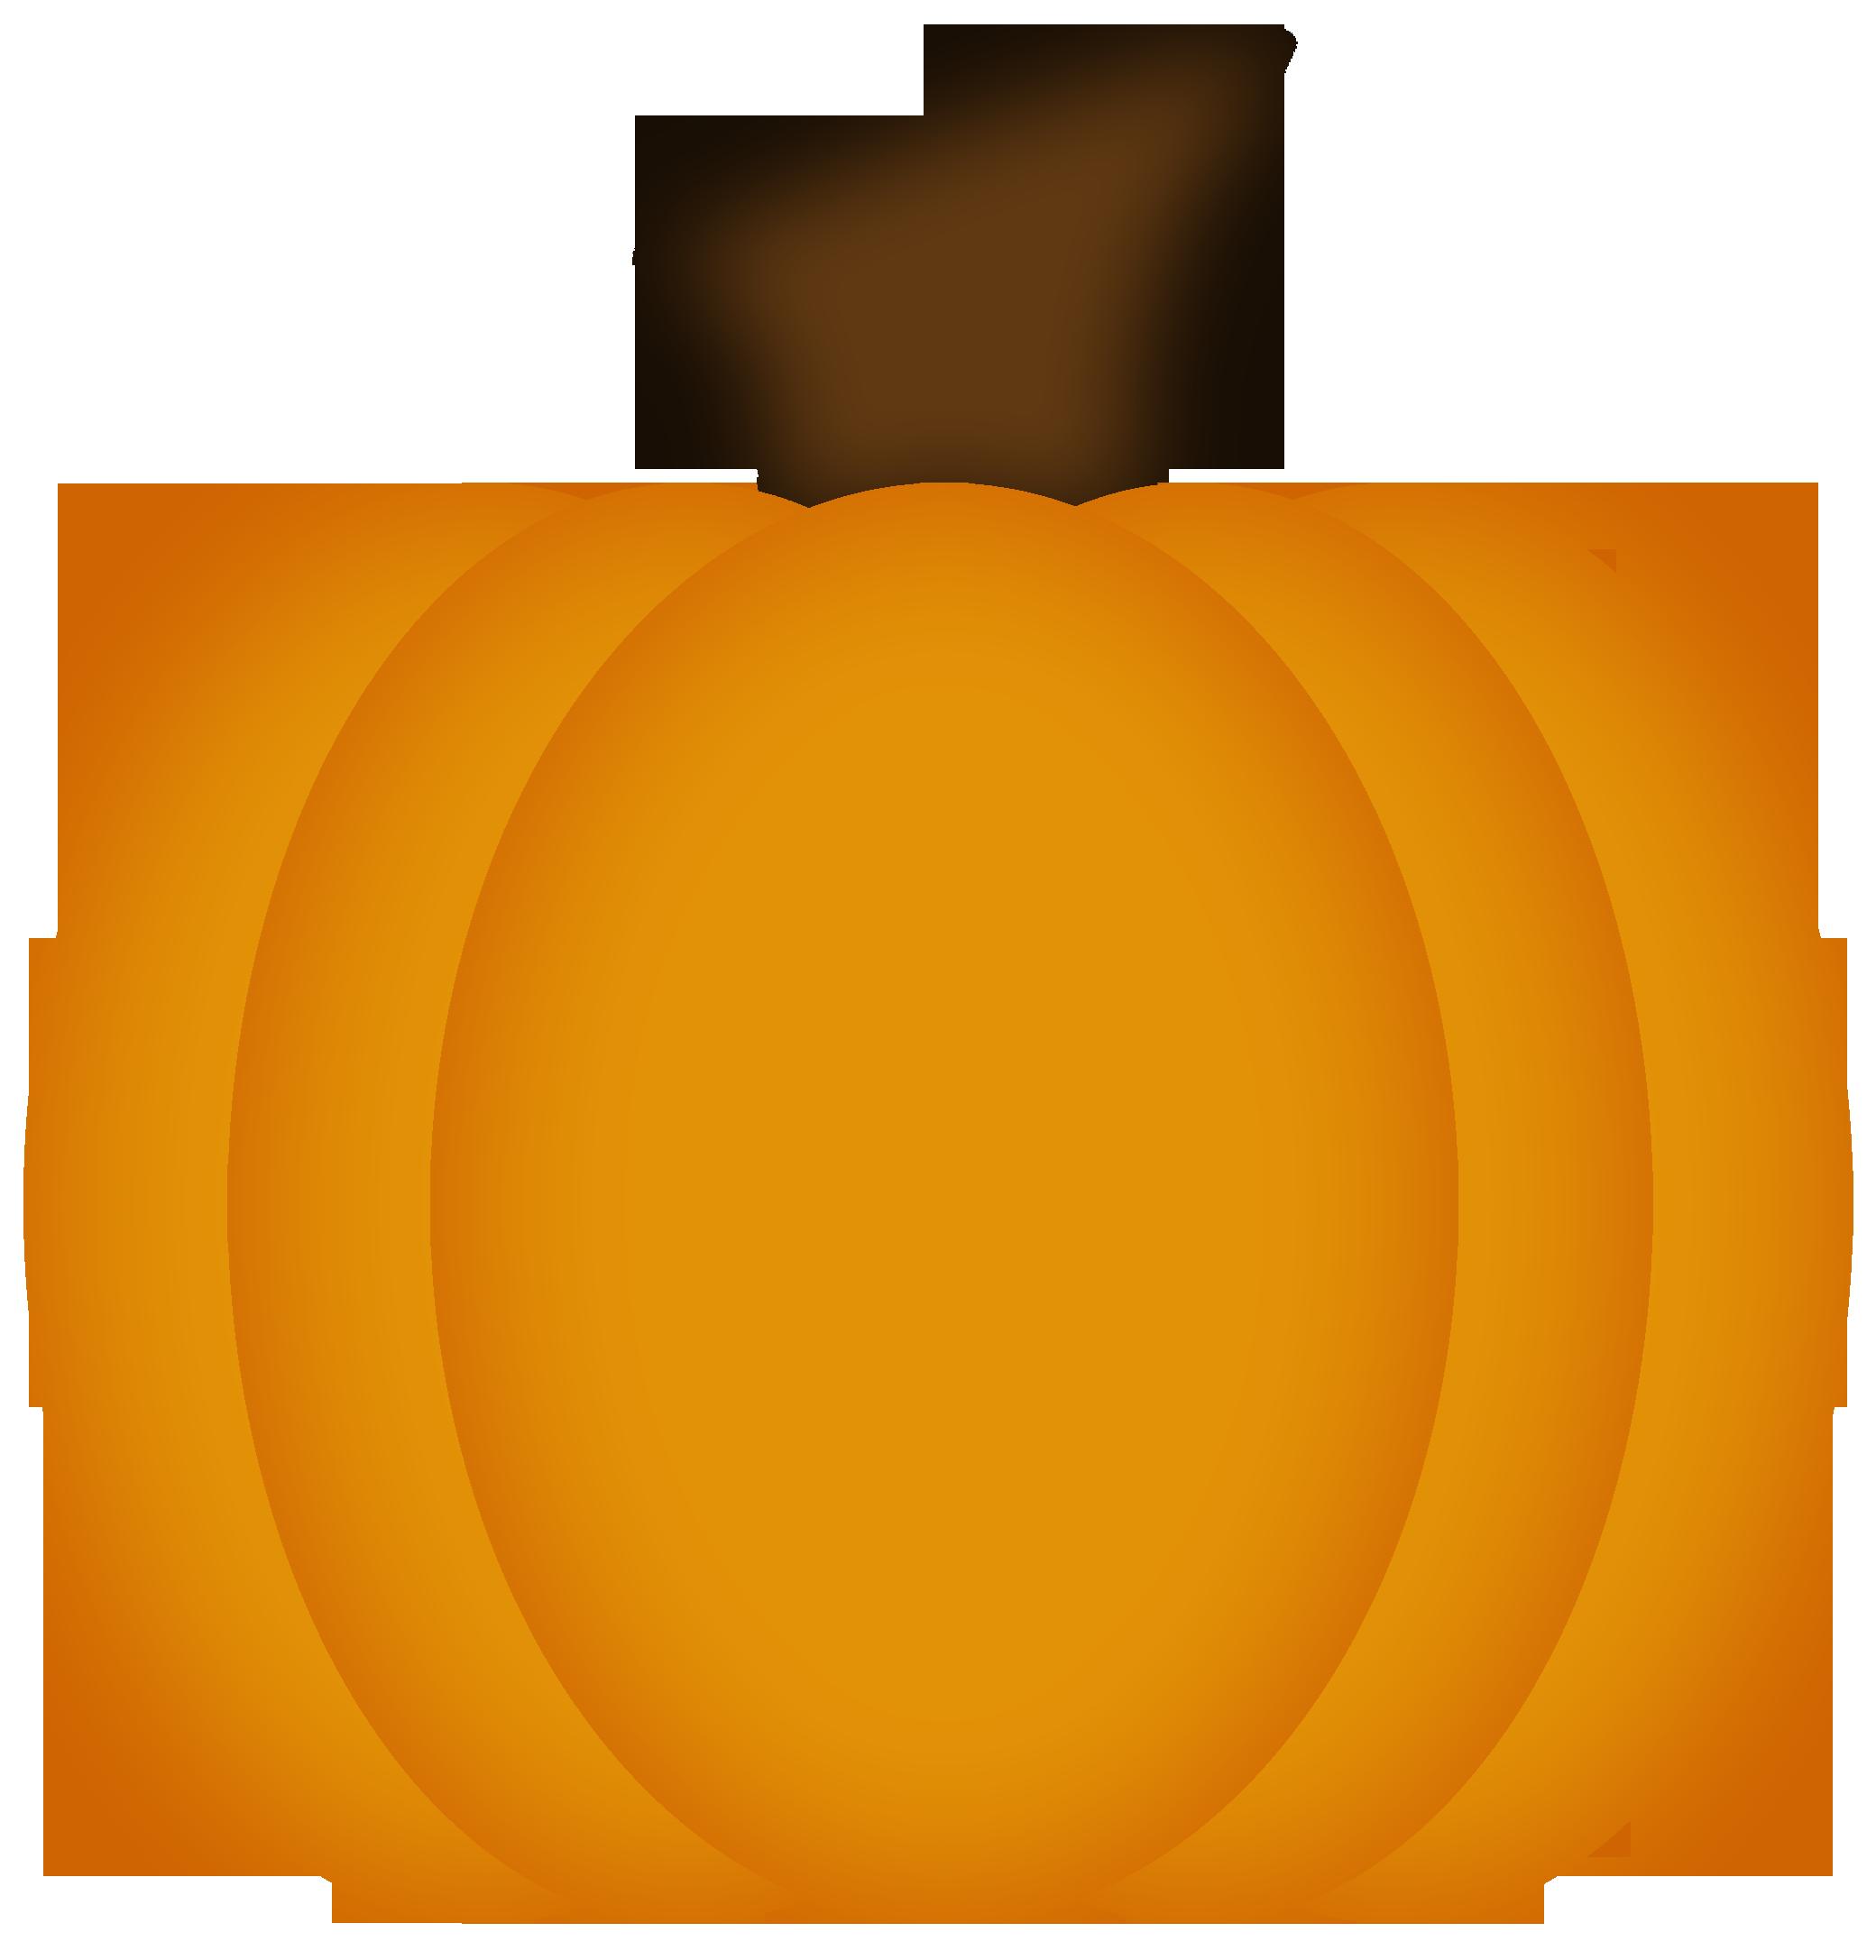 Pumpkin clipart shadow. Carving contest wildstar template